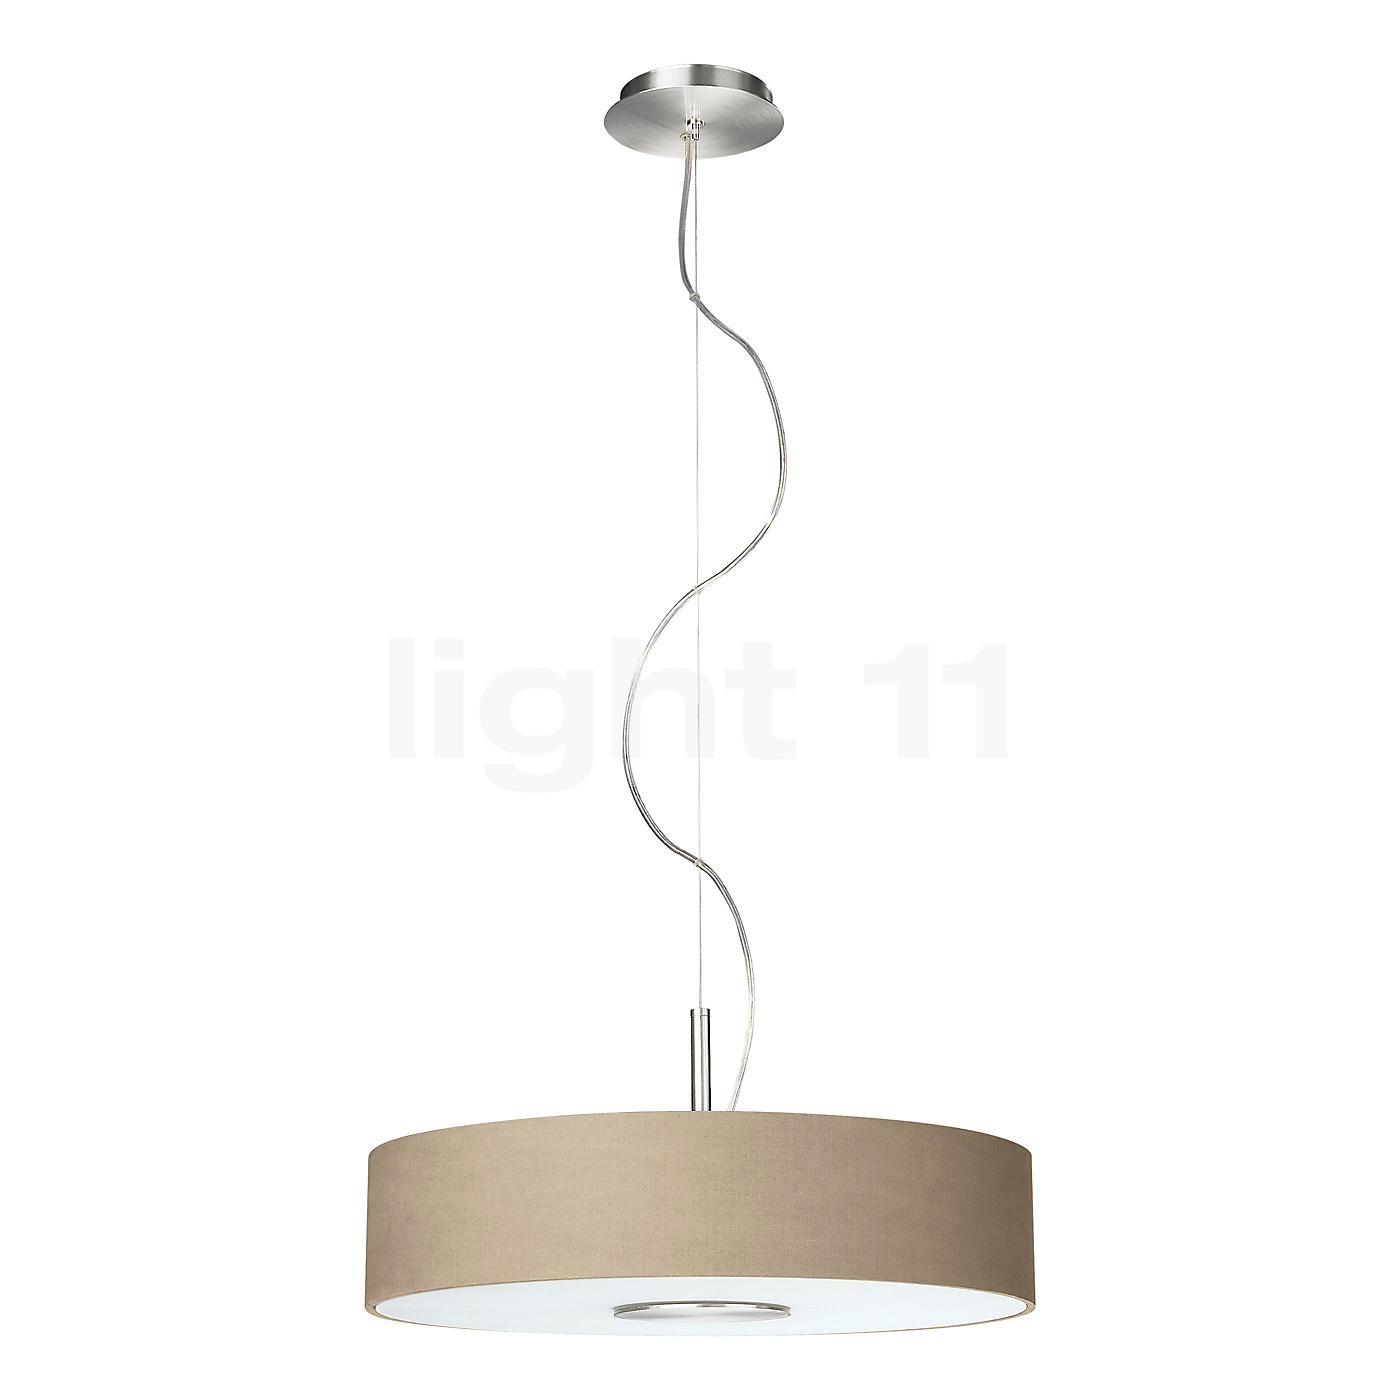 lampe f r stiegenhaus forum auf. Black Bedroom Furniture Sets. Home Design Ideas